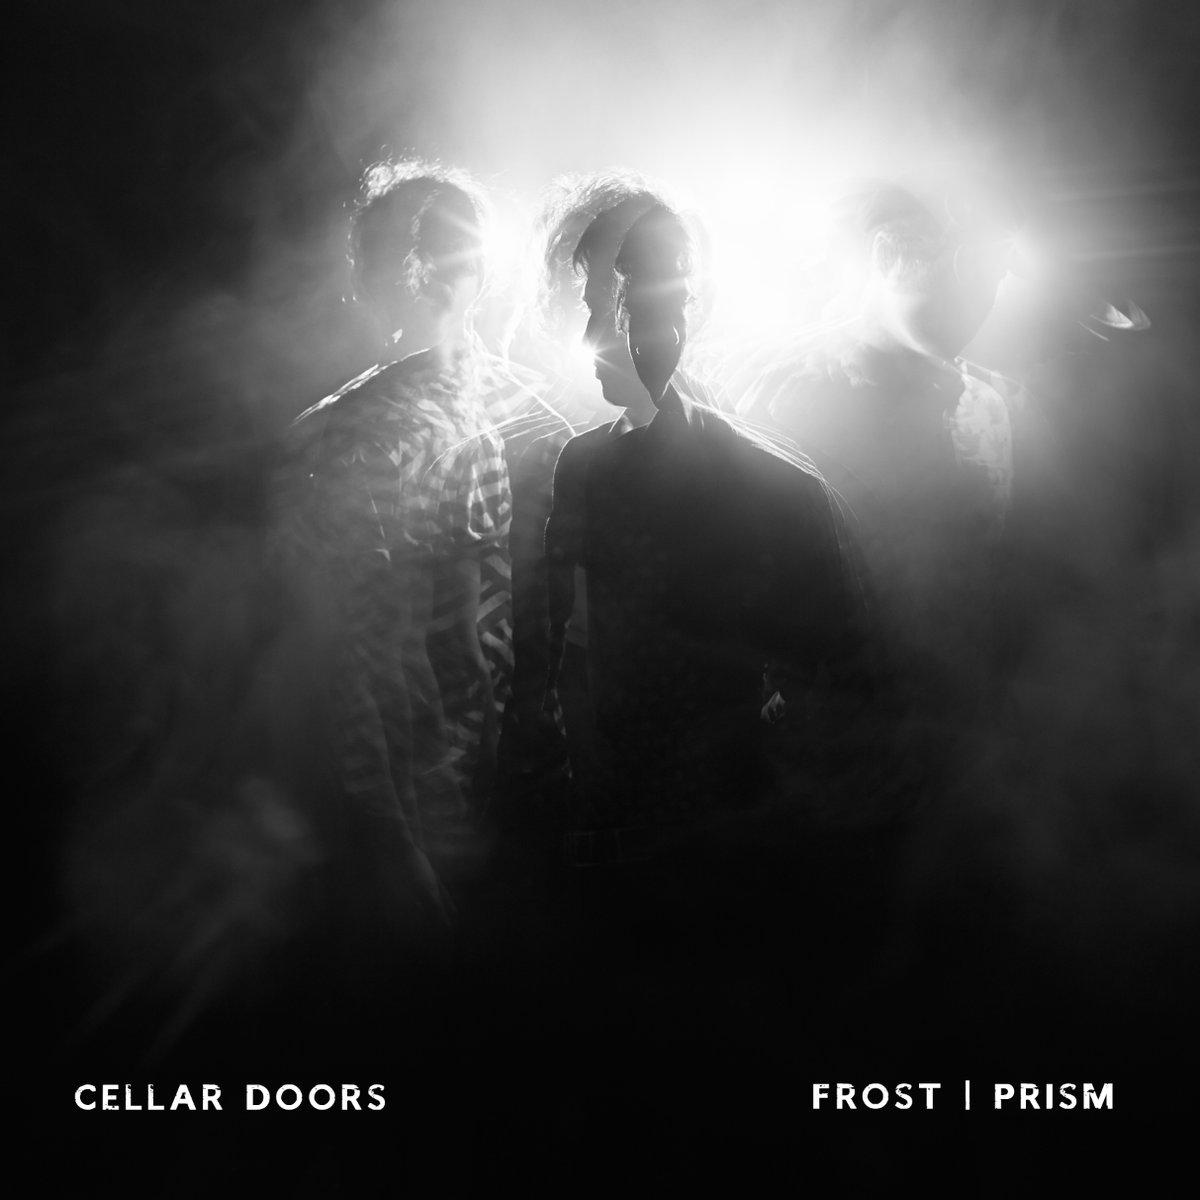 Cellar Doors Frost / Prism (San Francisco, 2016)